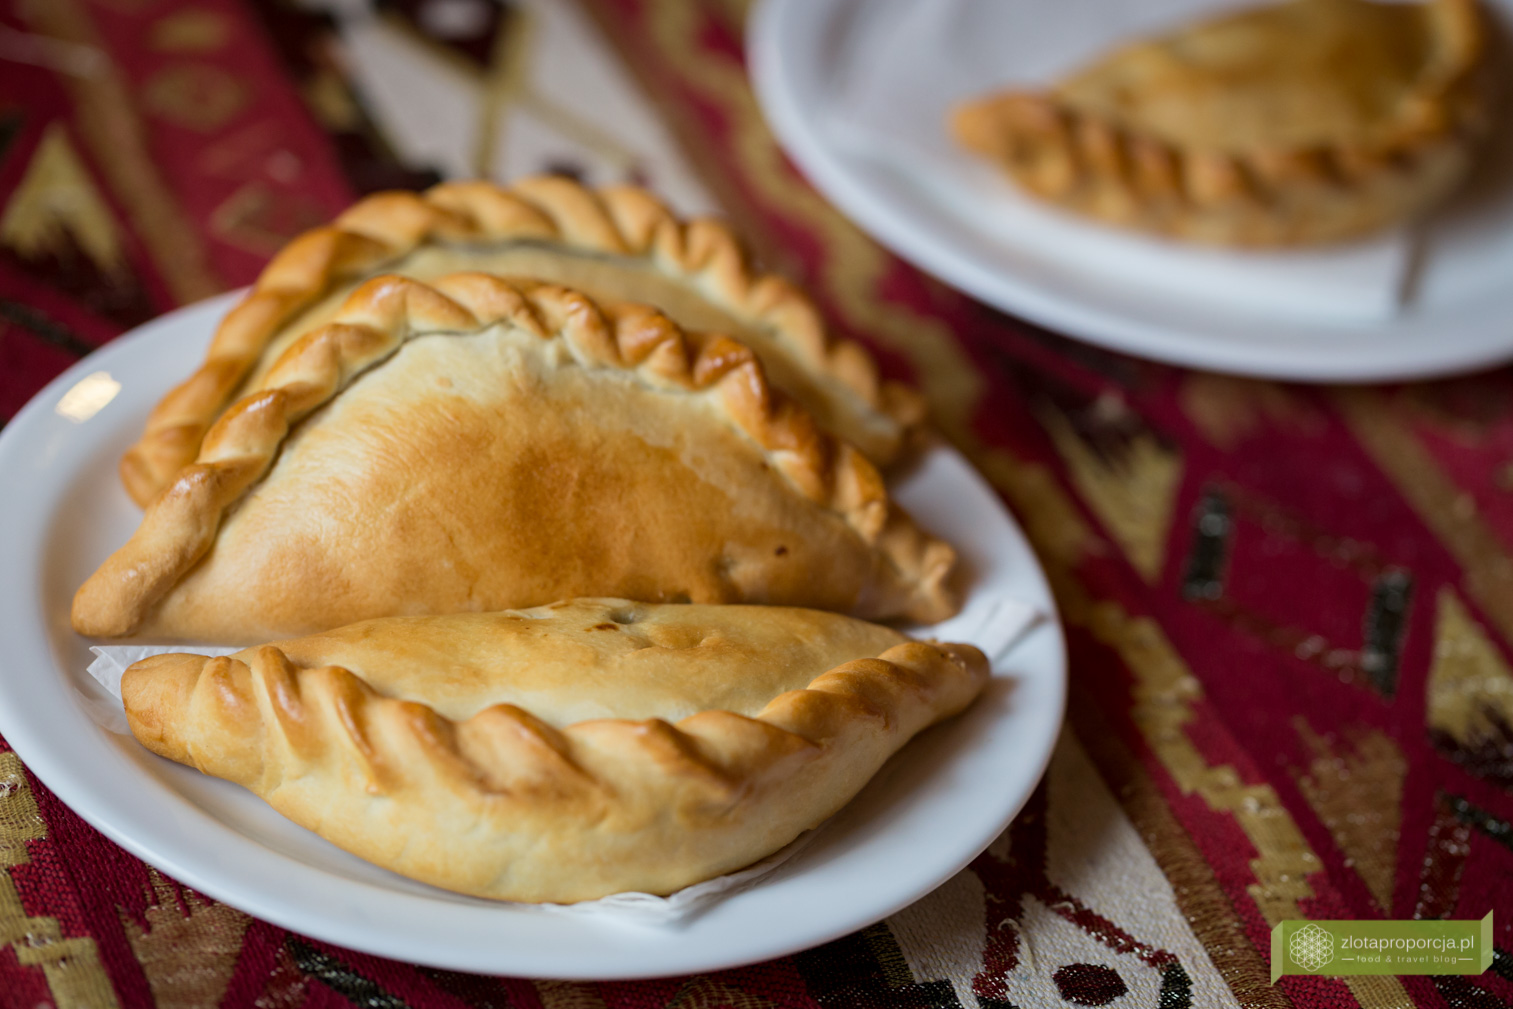 Kibini, Kibiny, Karaimi, Troki, okolice Wilna, Litwa, atrakcje Litwy, kuchnia litewska